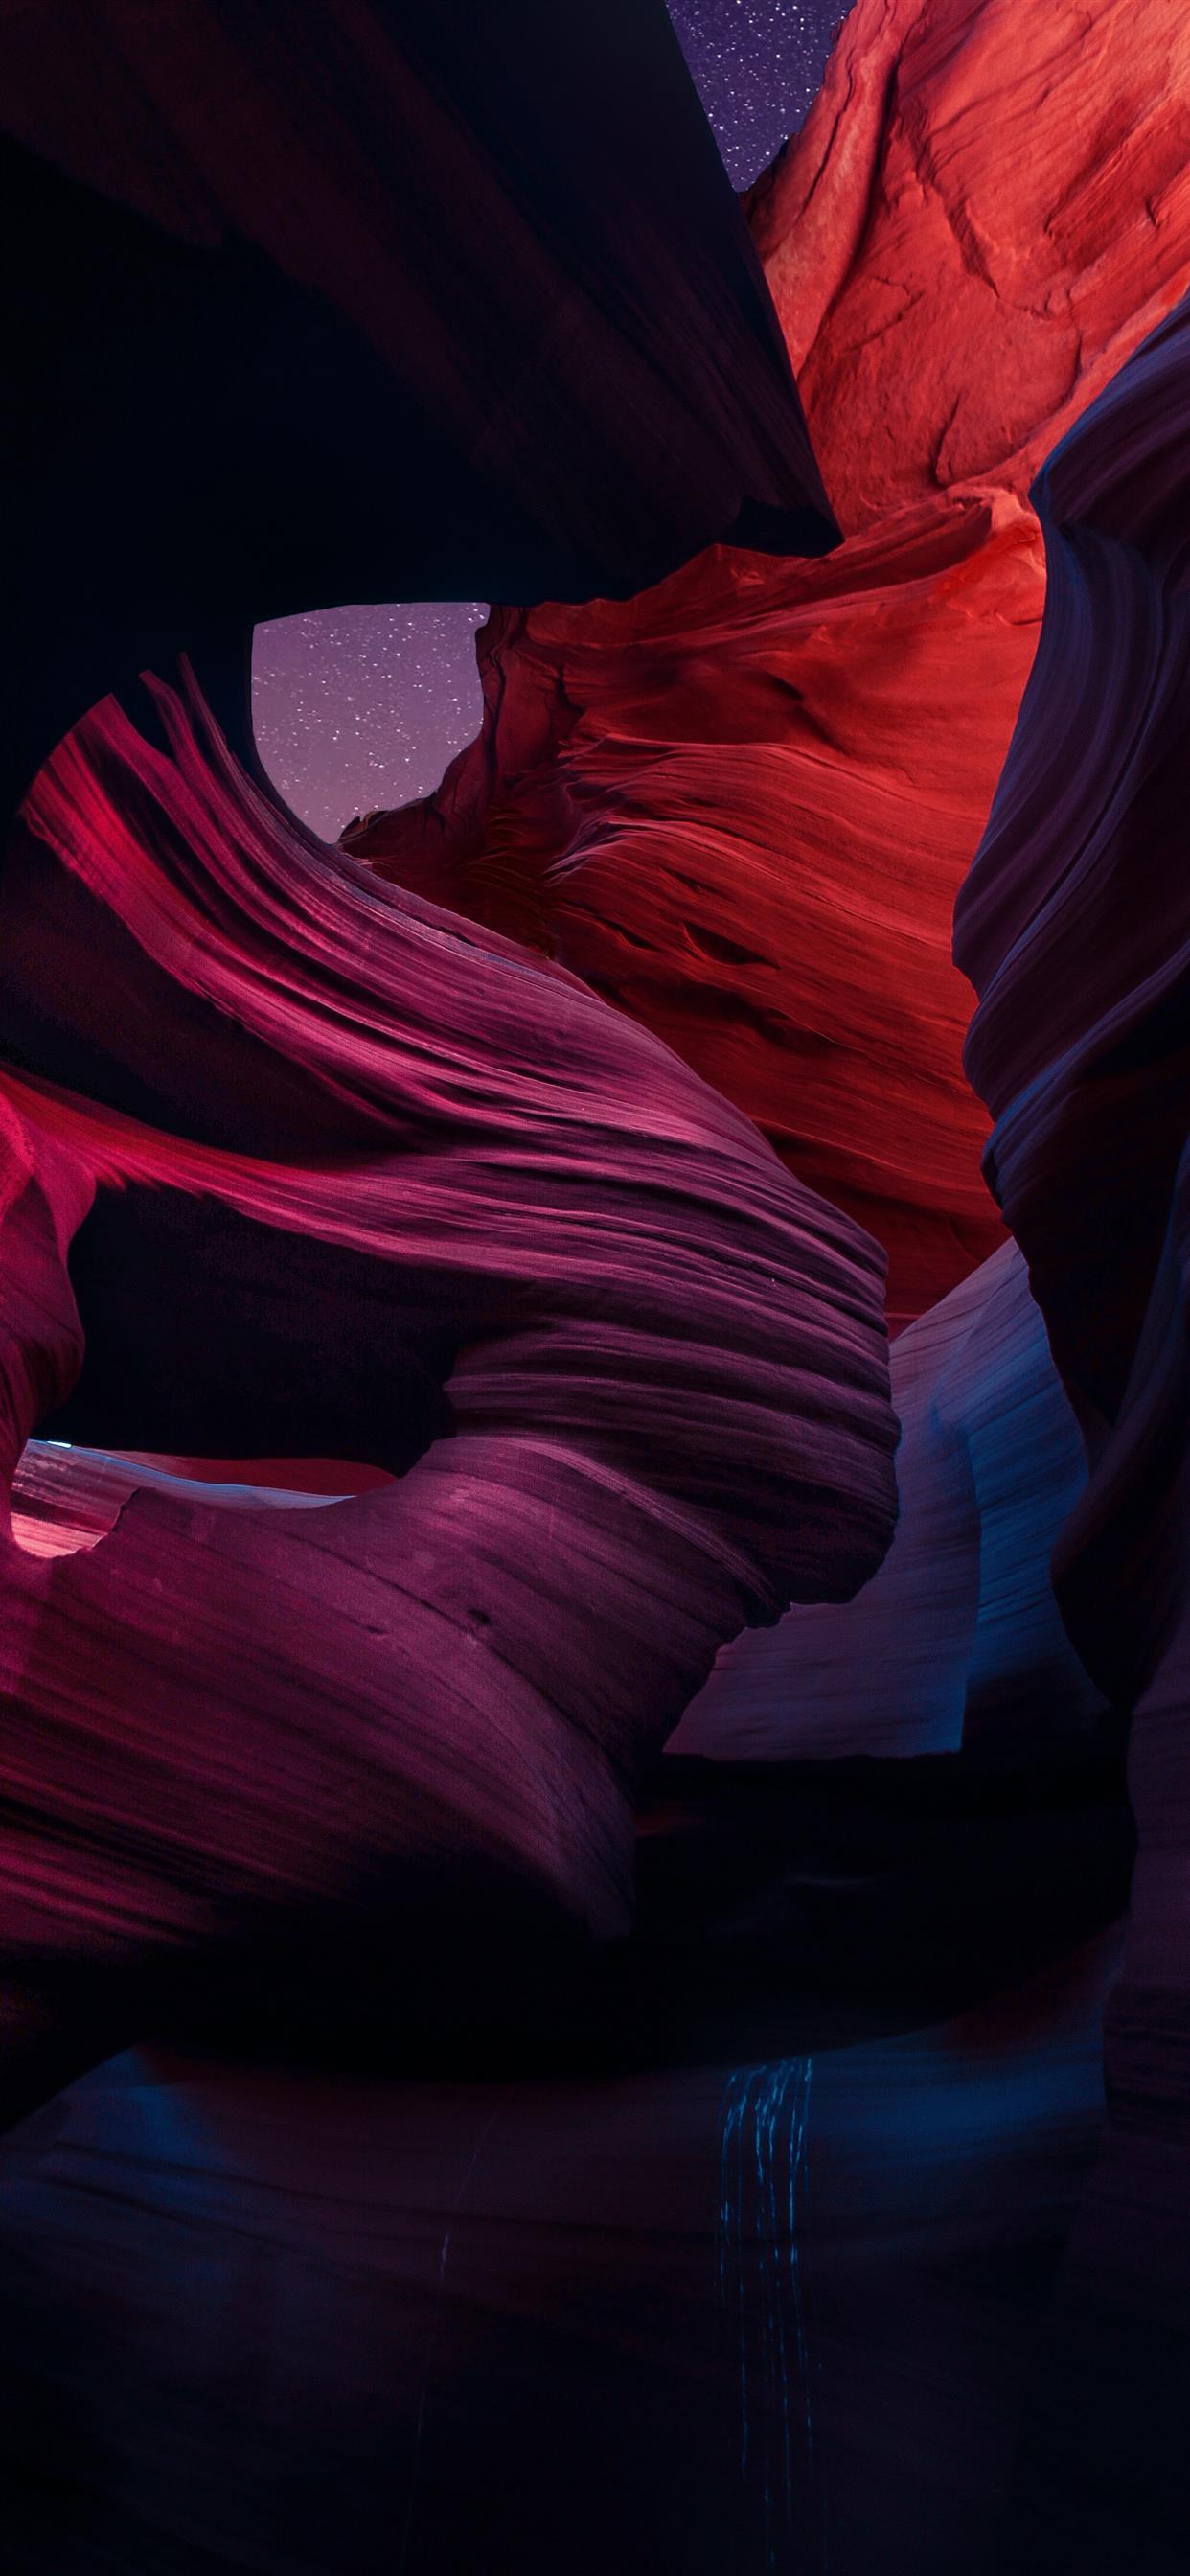 brown rock formation digital wallpaper iphone xs max wallpaper